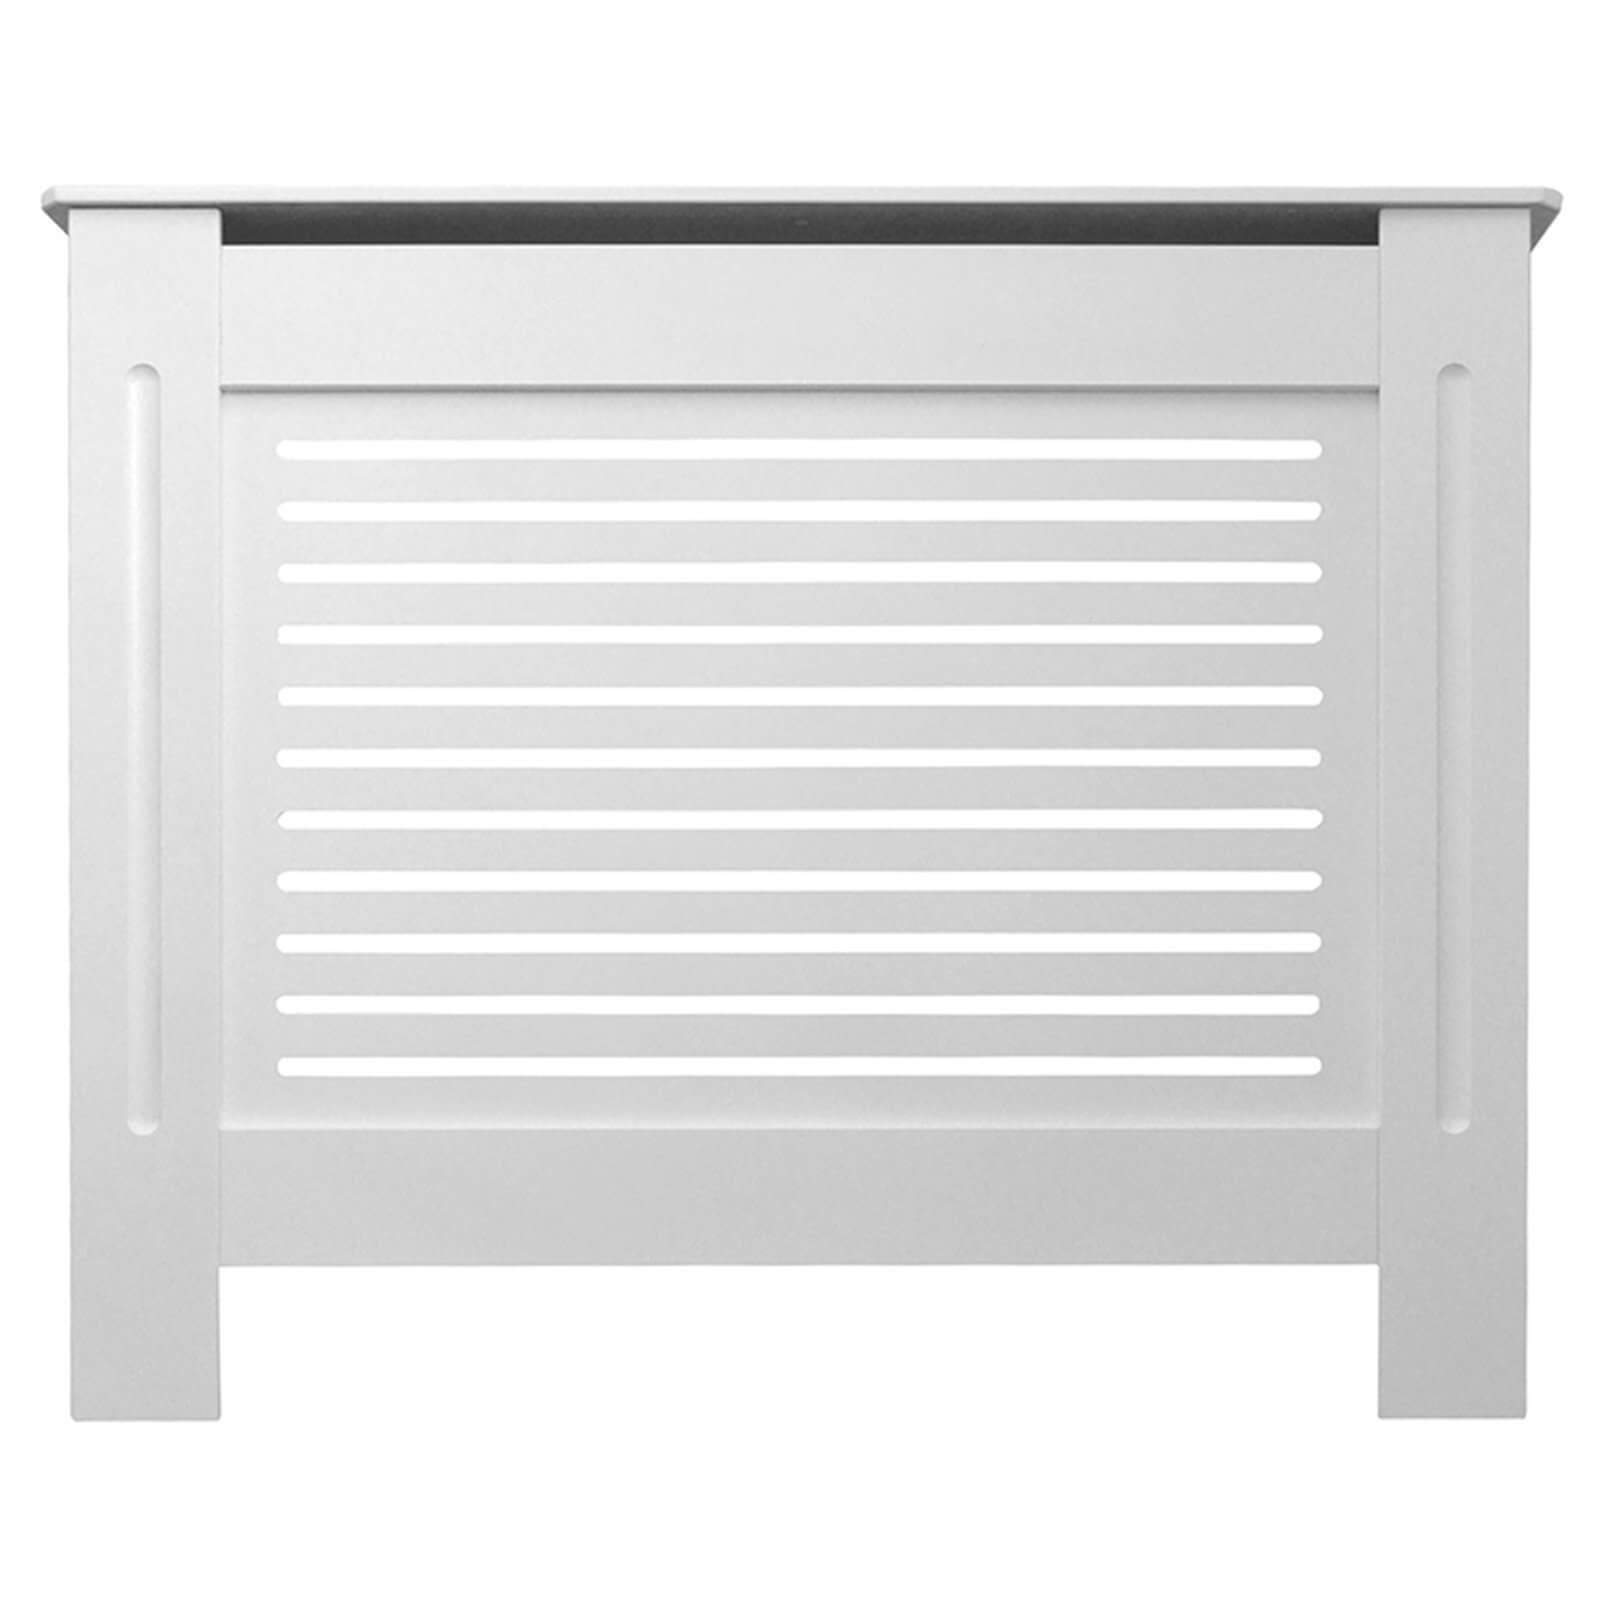 Horizontal White Radiator Cover - Small